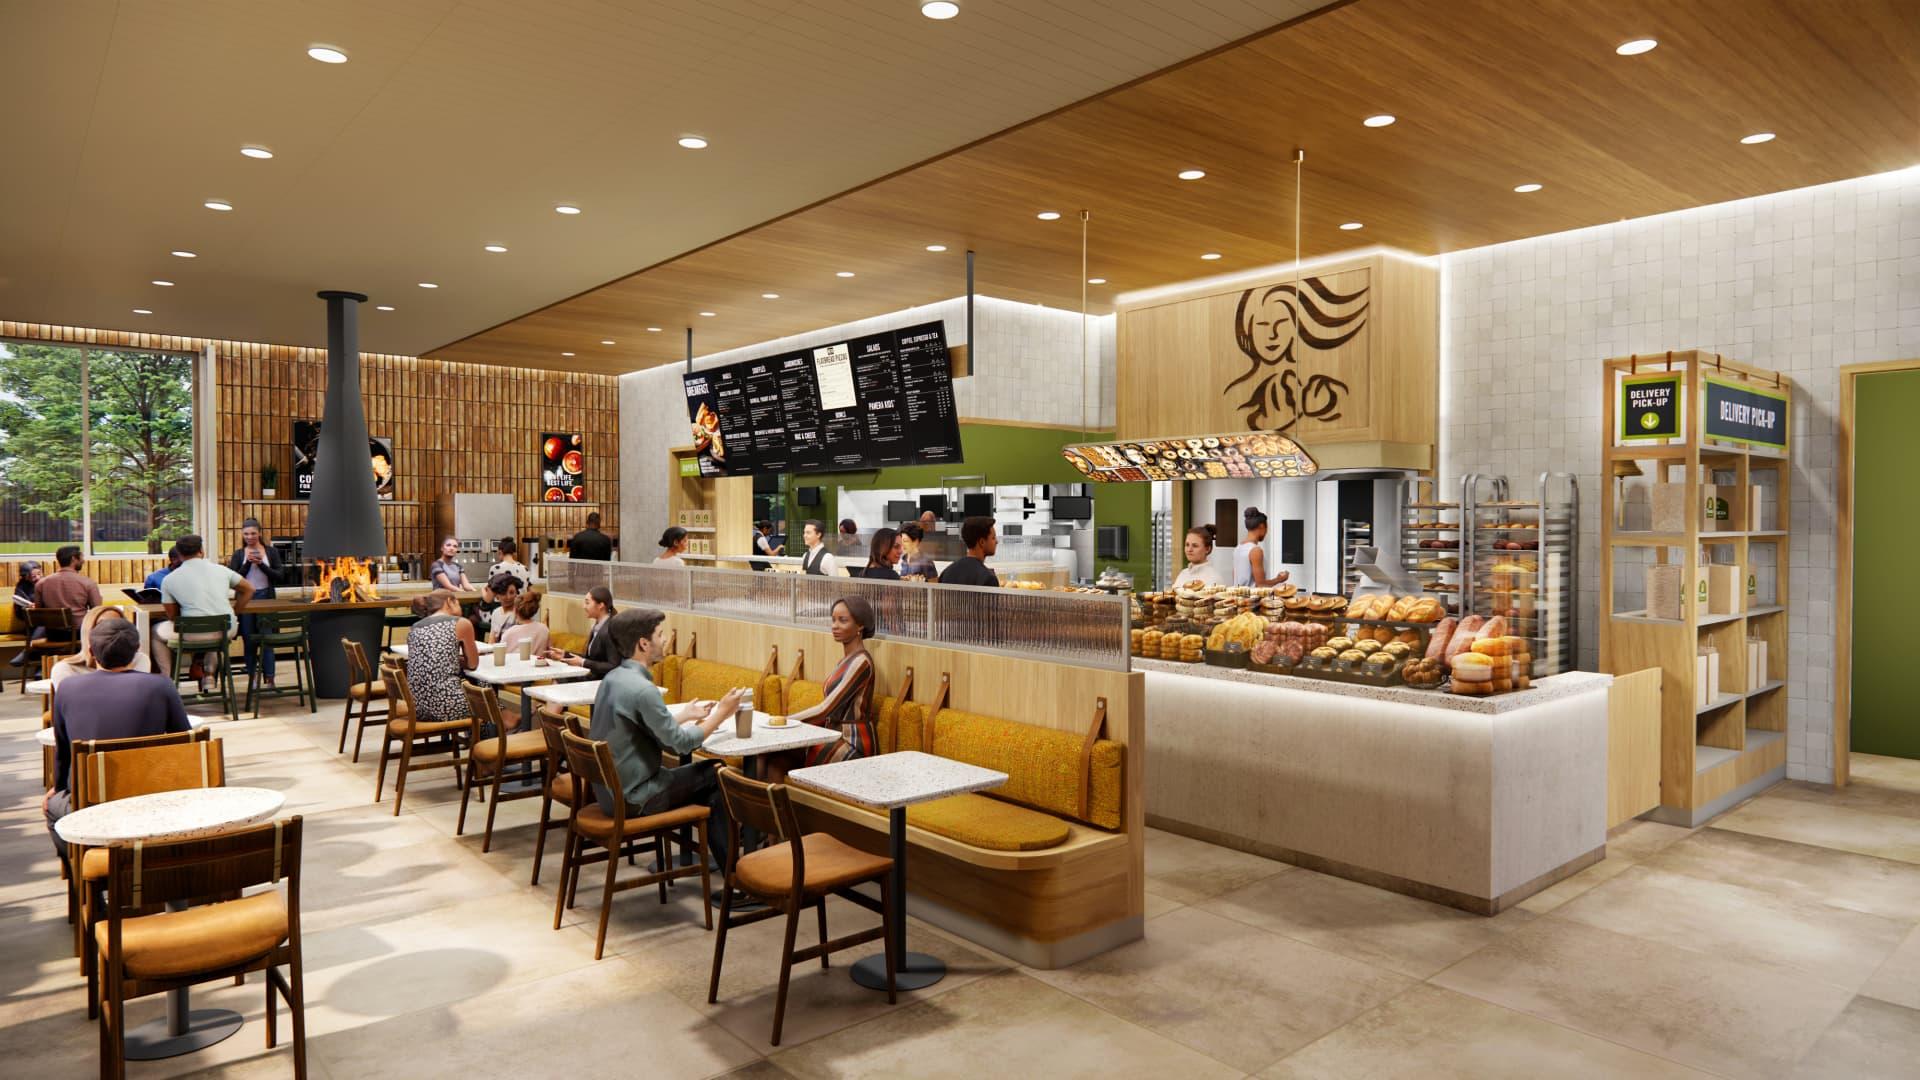 Rendering of the interior of Panera Bread's latest design